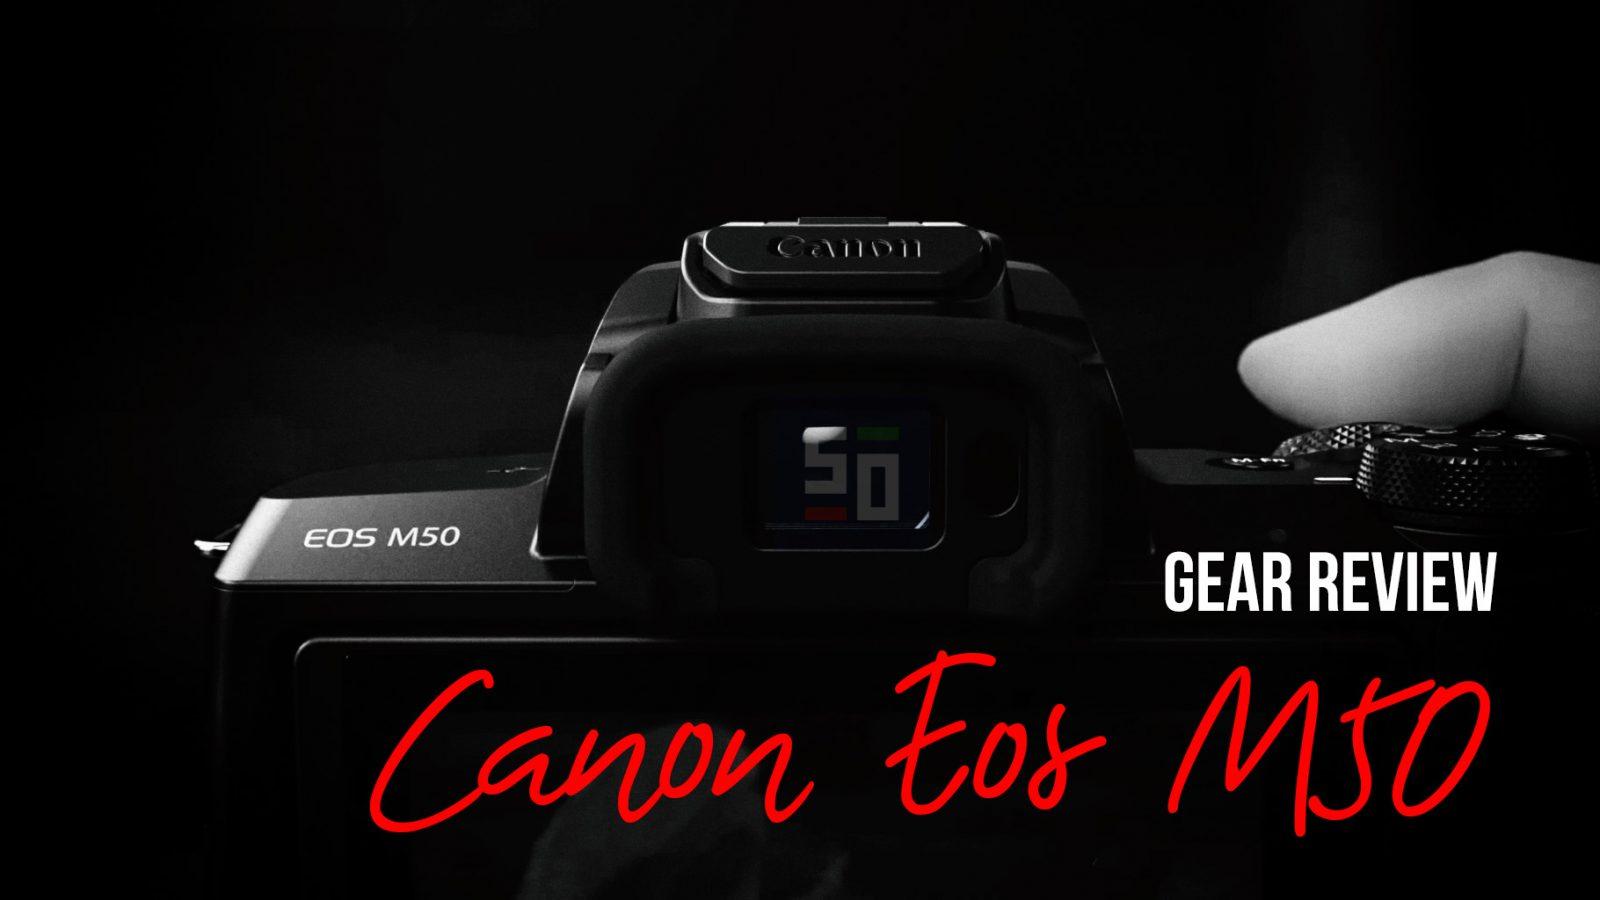 Gear Review - Canon EOS M50 - Chiếc máy mirrorless mới nhất của Canon   50mm Vietnam